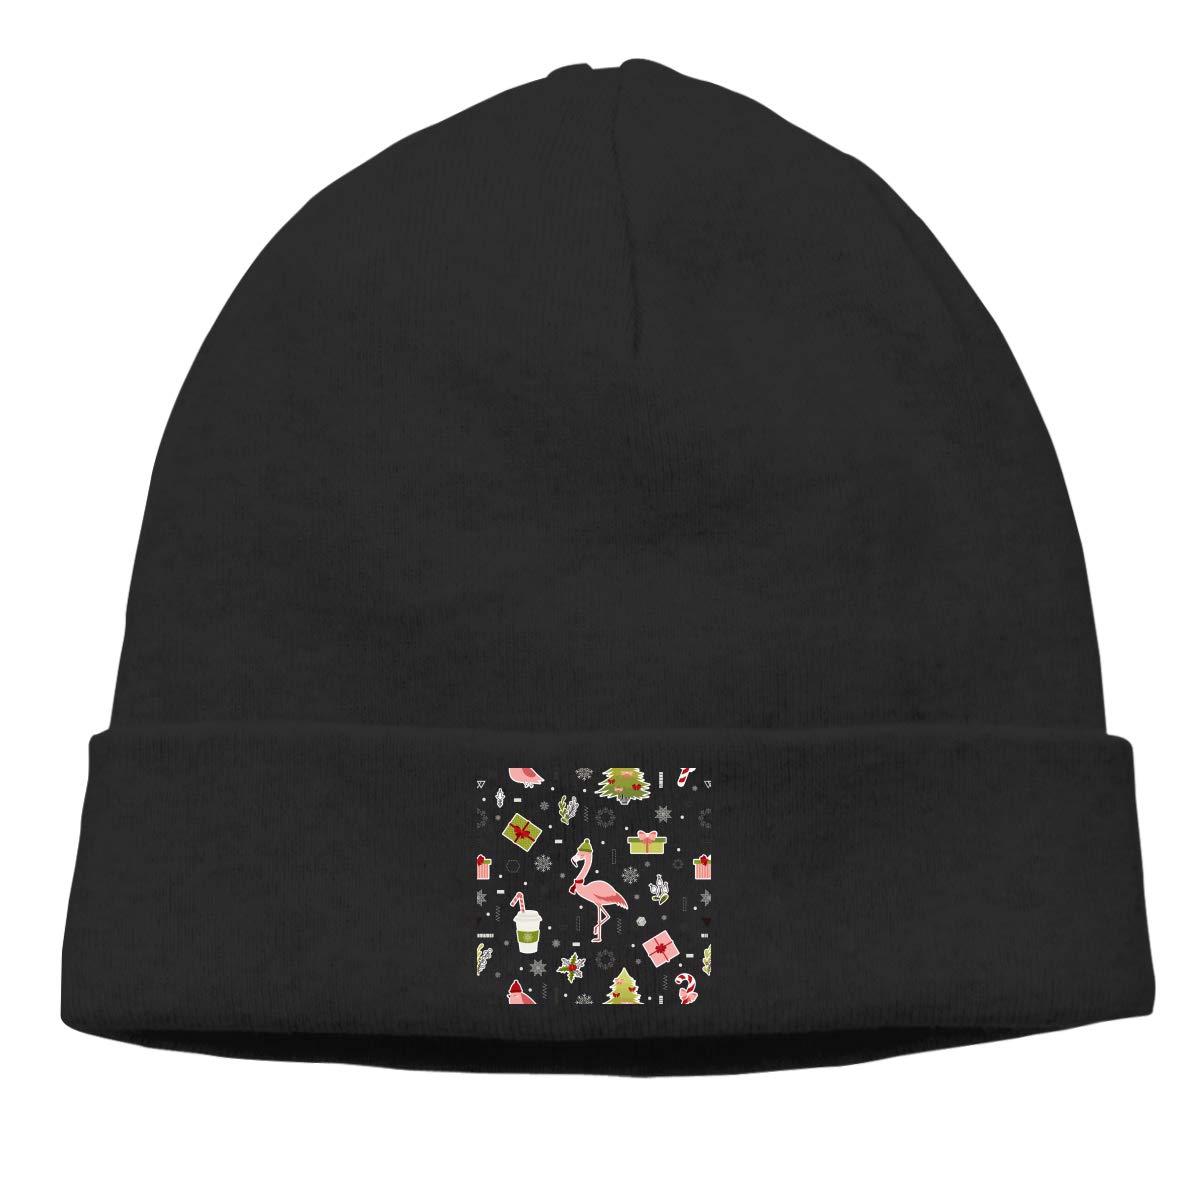 Cute Flamingo Christmas Hot Pink Cap Mens/&Womens Oversized Baggy Beanie Hats Slouchy Beanie Hat